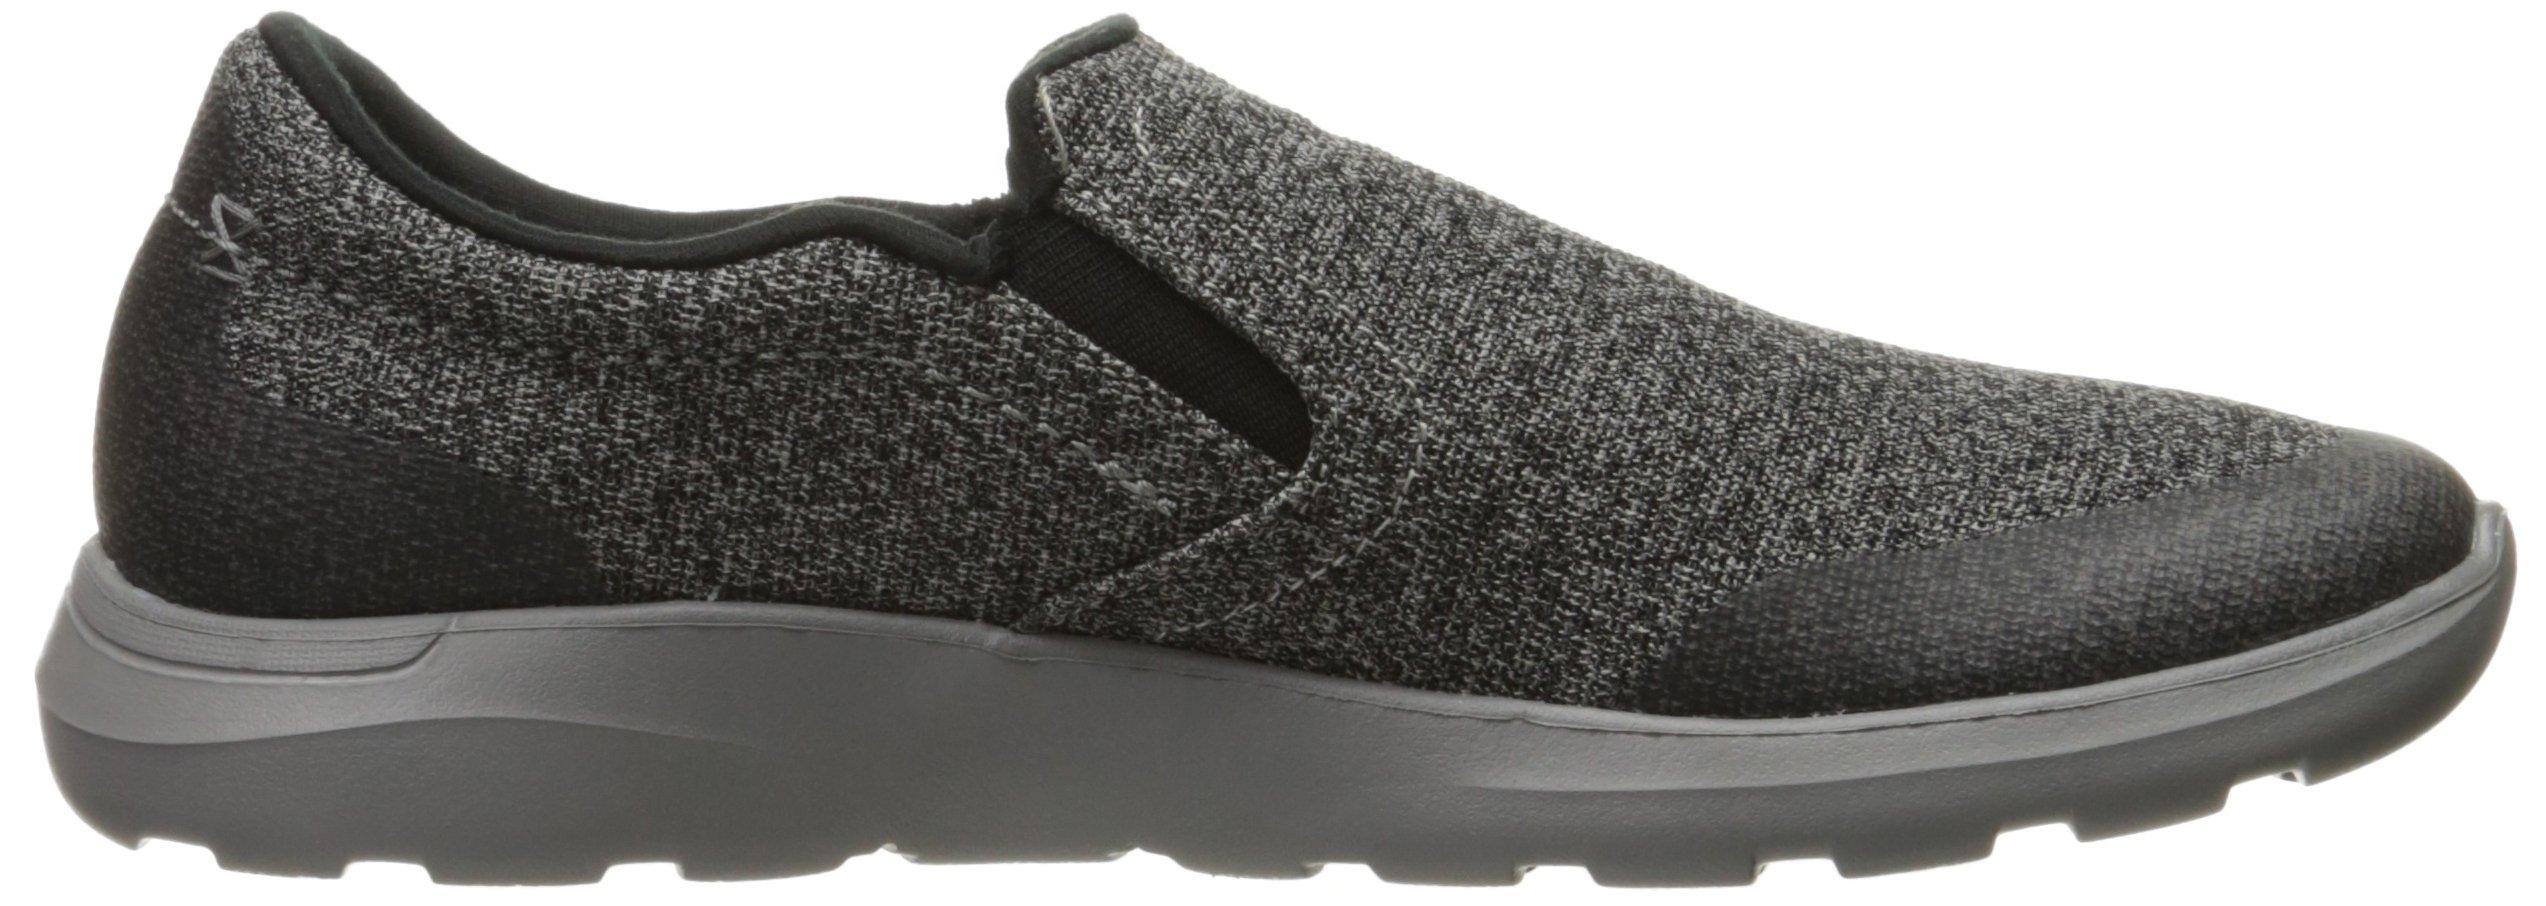 c0df0c643cd1 Crocs Men s Kinsale Static Slip-on M Fashion Sneaker